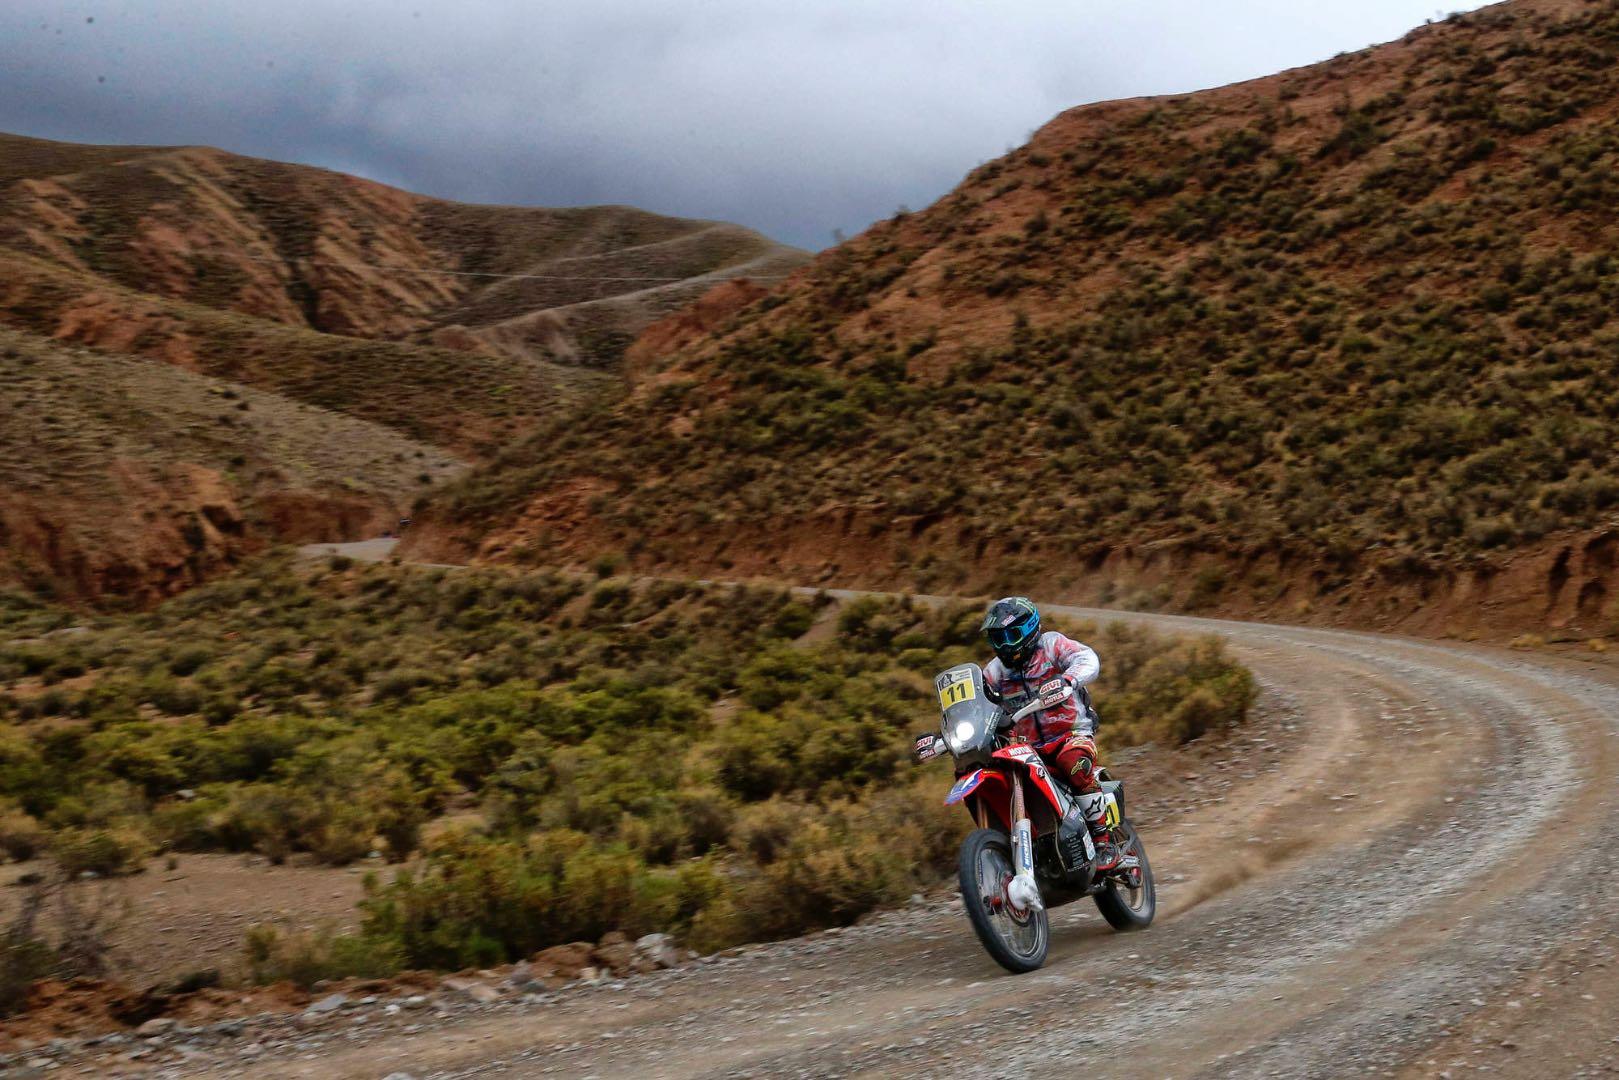 Honda Joan Barreda Bort 2017 Dakar Rally Stage 5